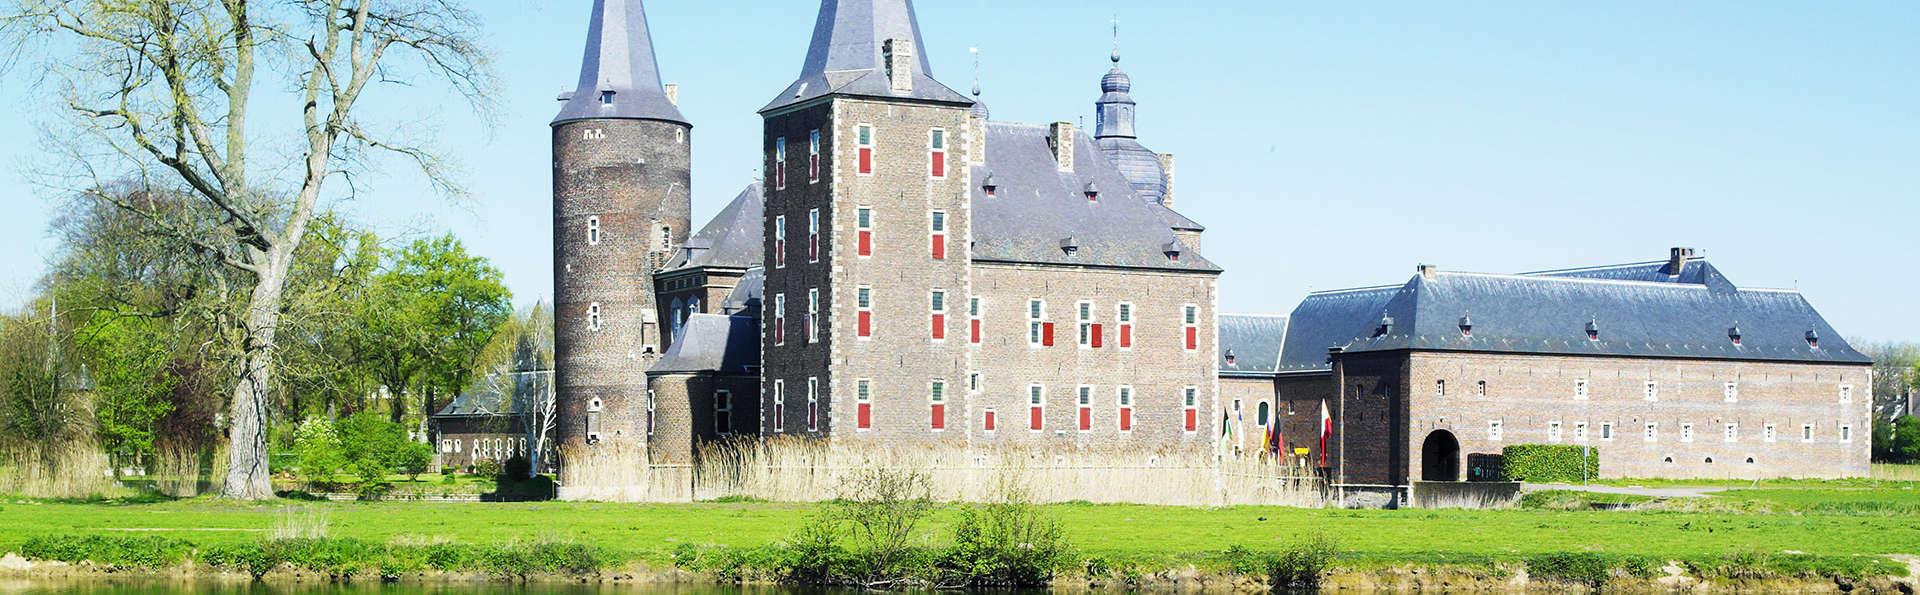 Rêvez et profitez dans la belle ville d'Heerlen